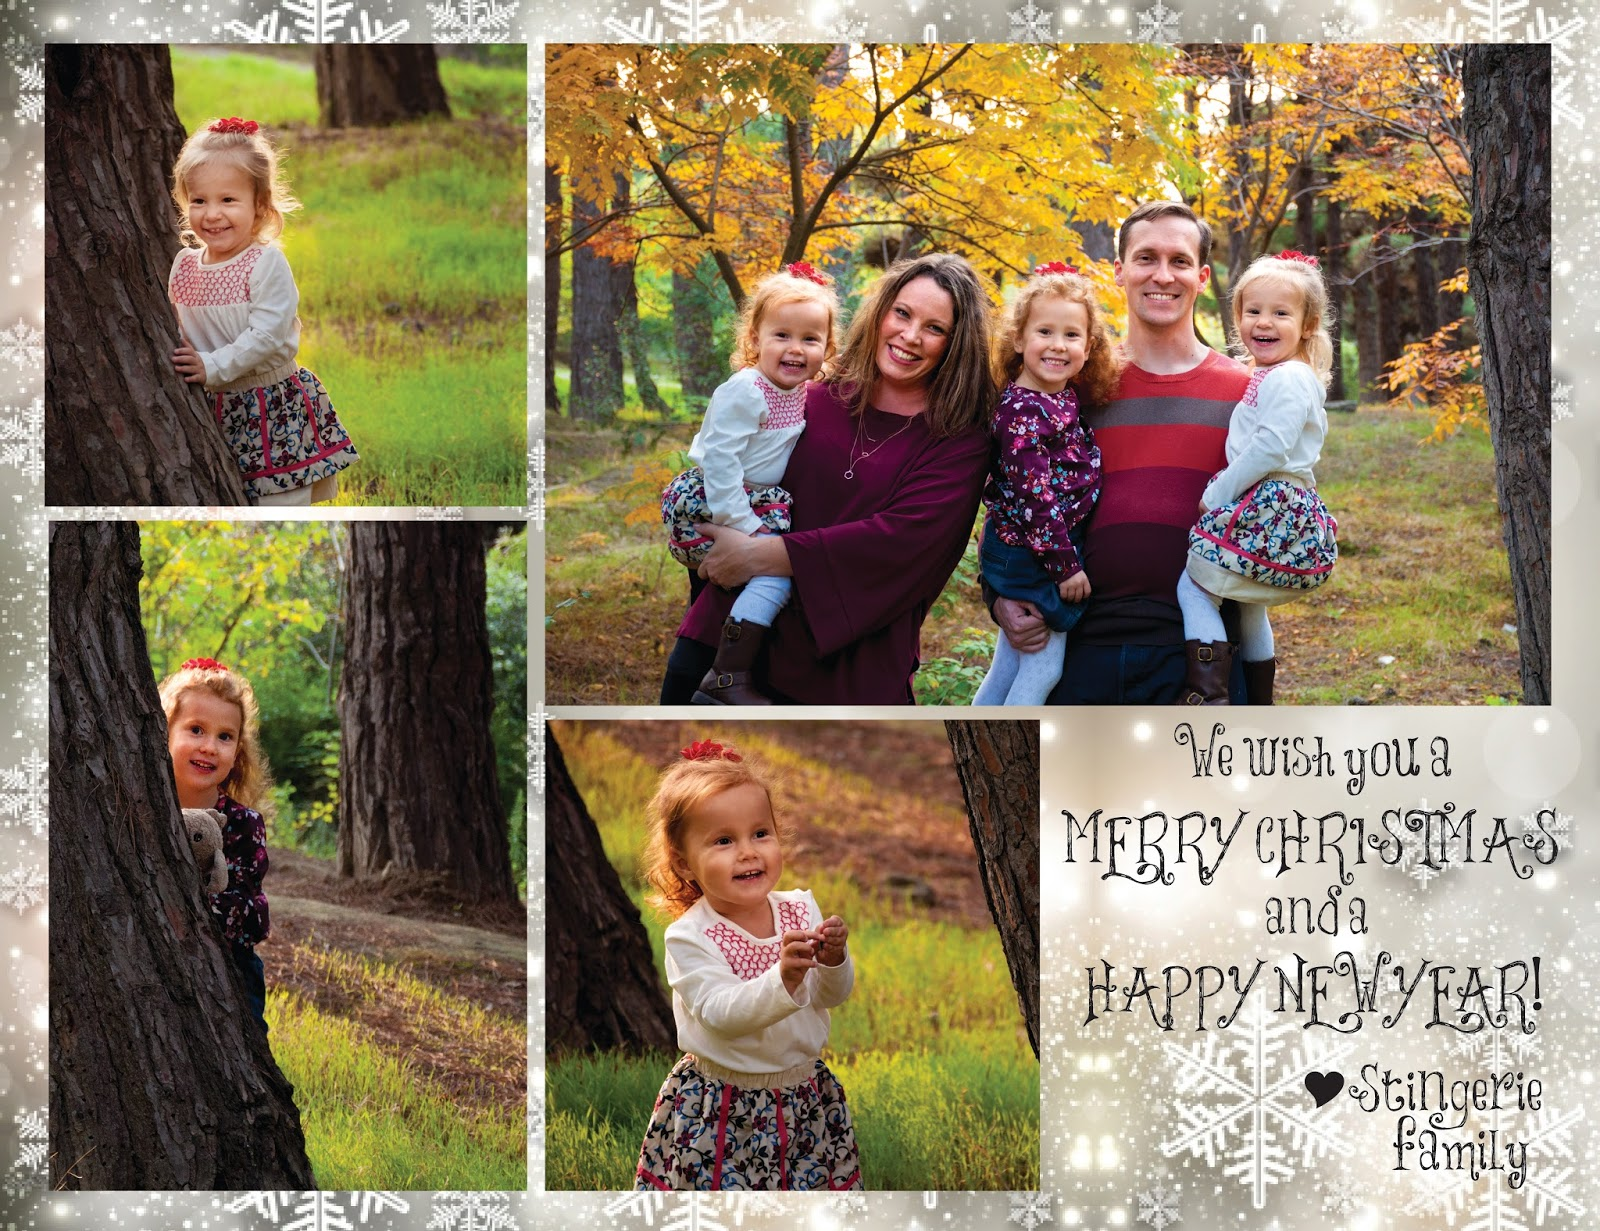 The Stingeries: Christmas Card 2017